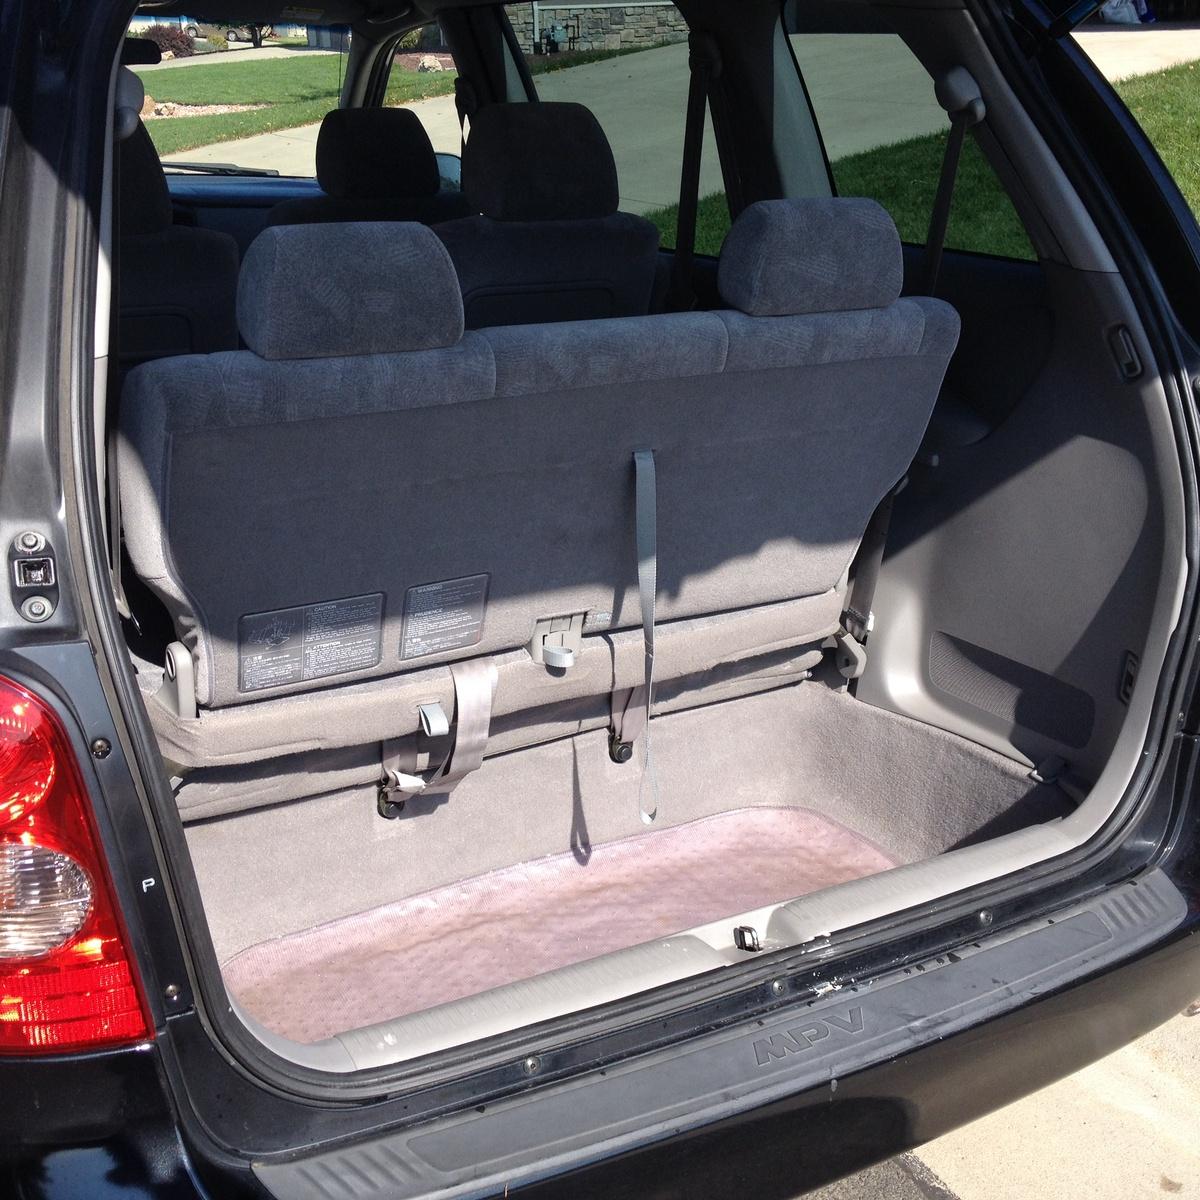 1997 Mazda Mpv Exterior: 2003 Mazda MPV